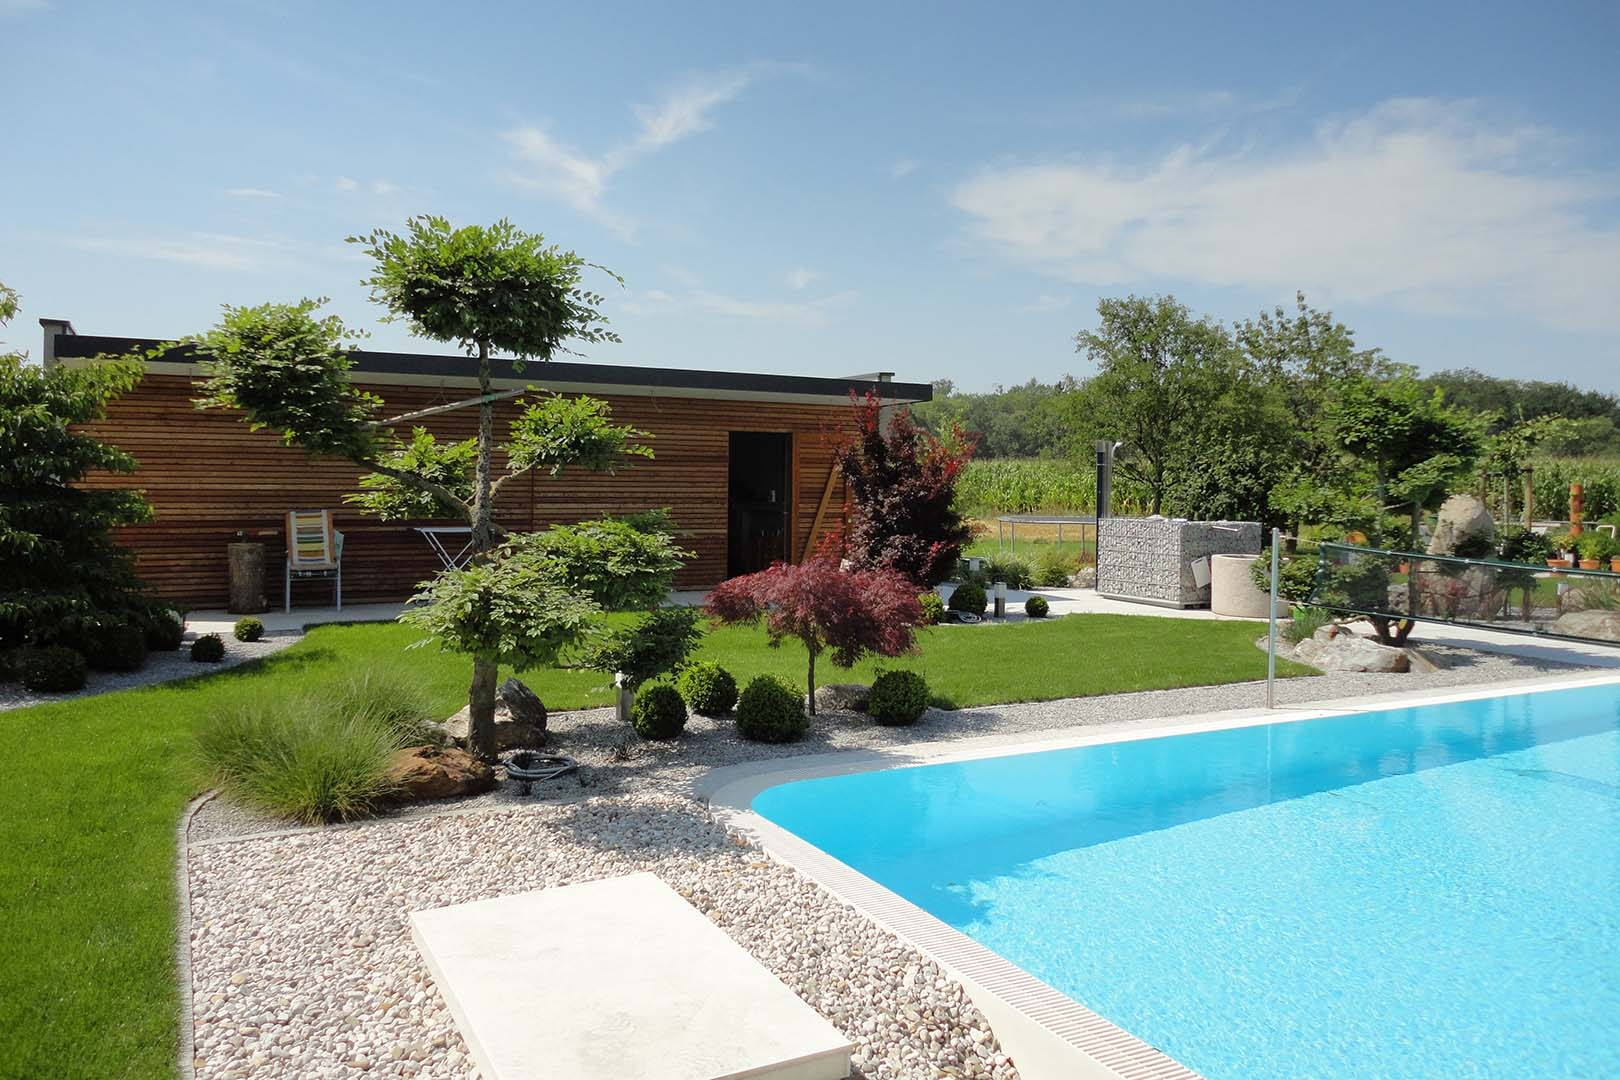 Gartendesign Swimmingpool